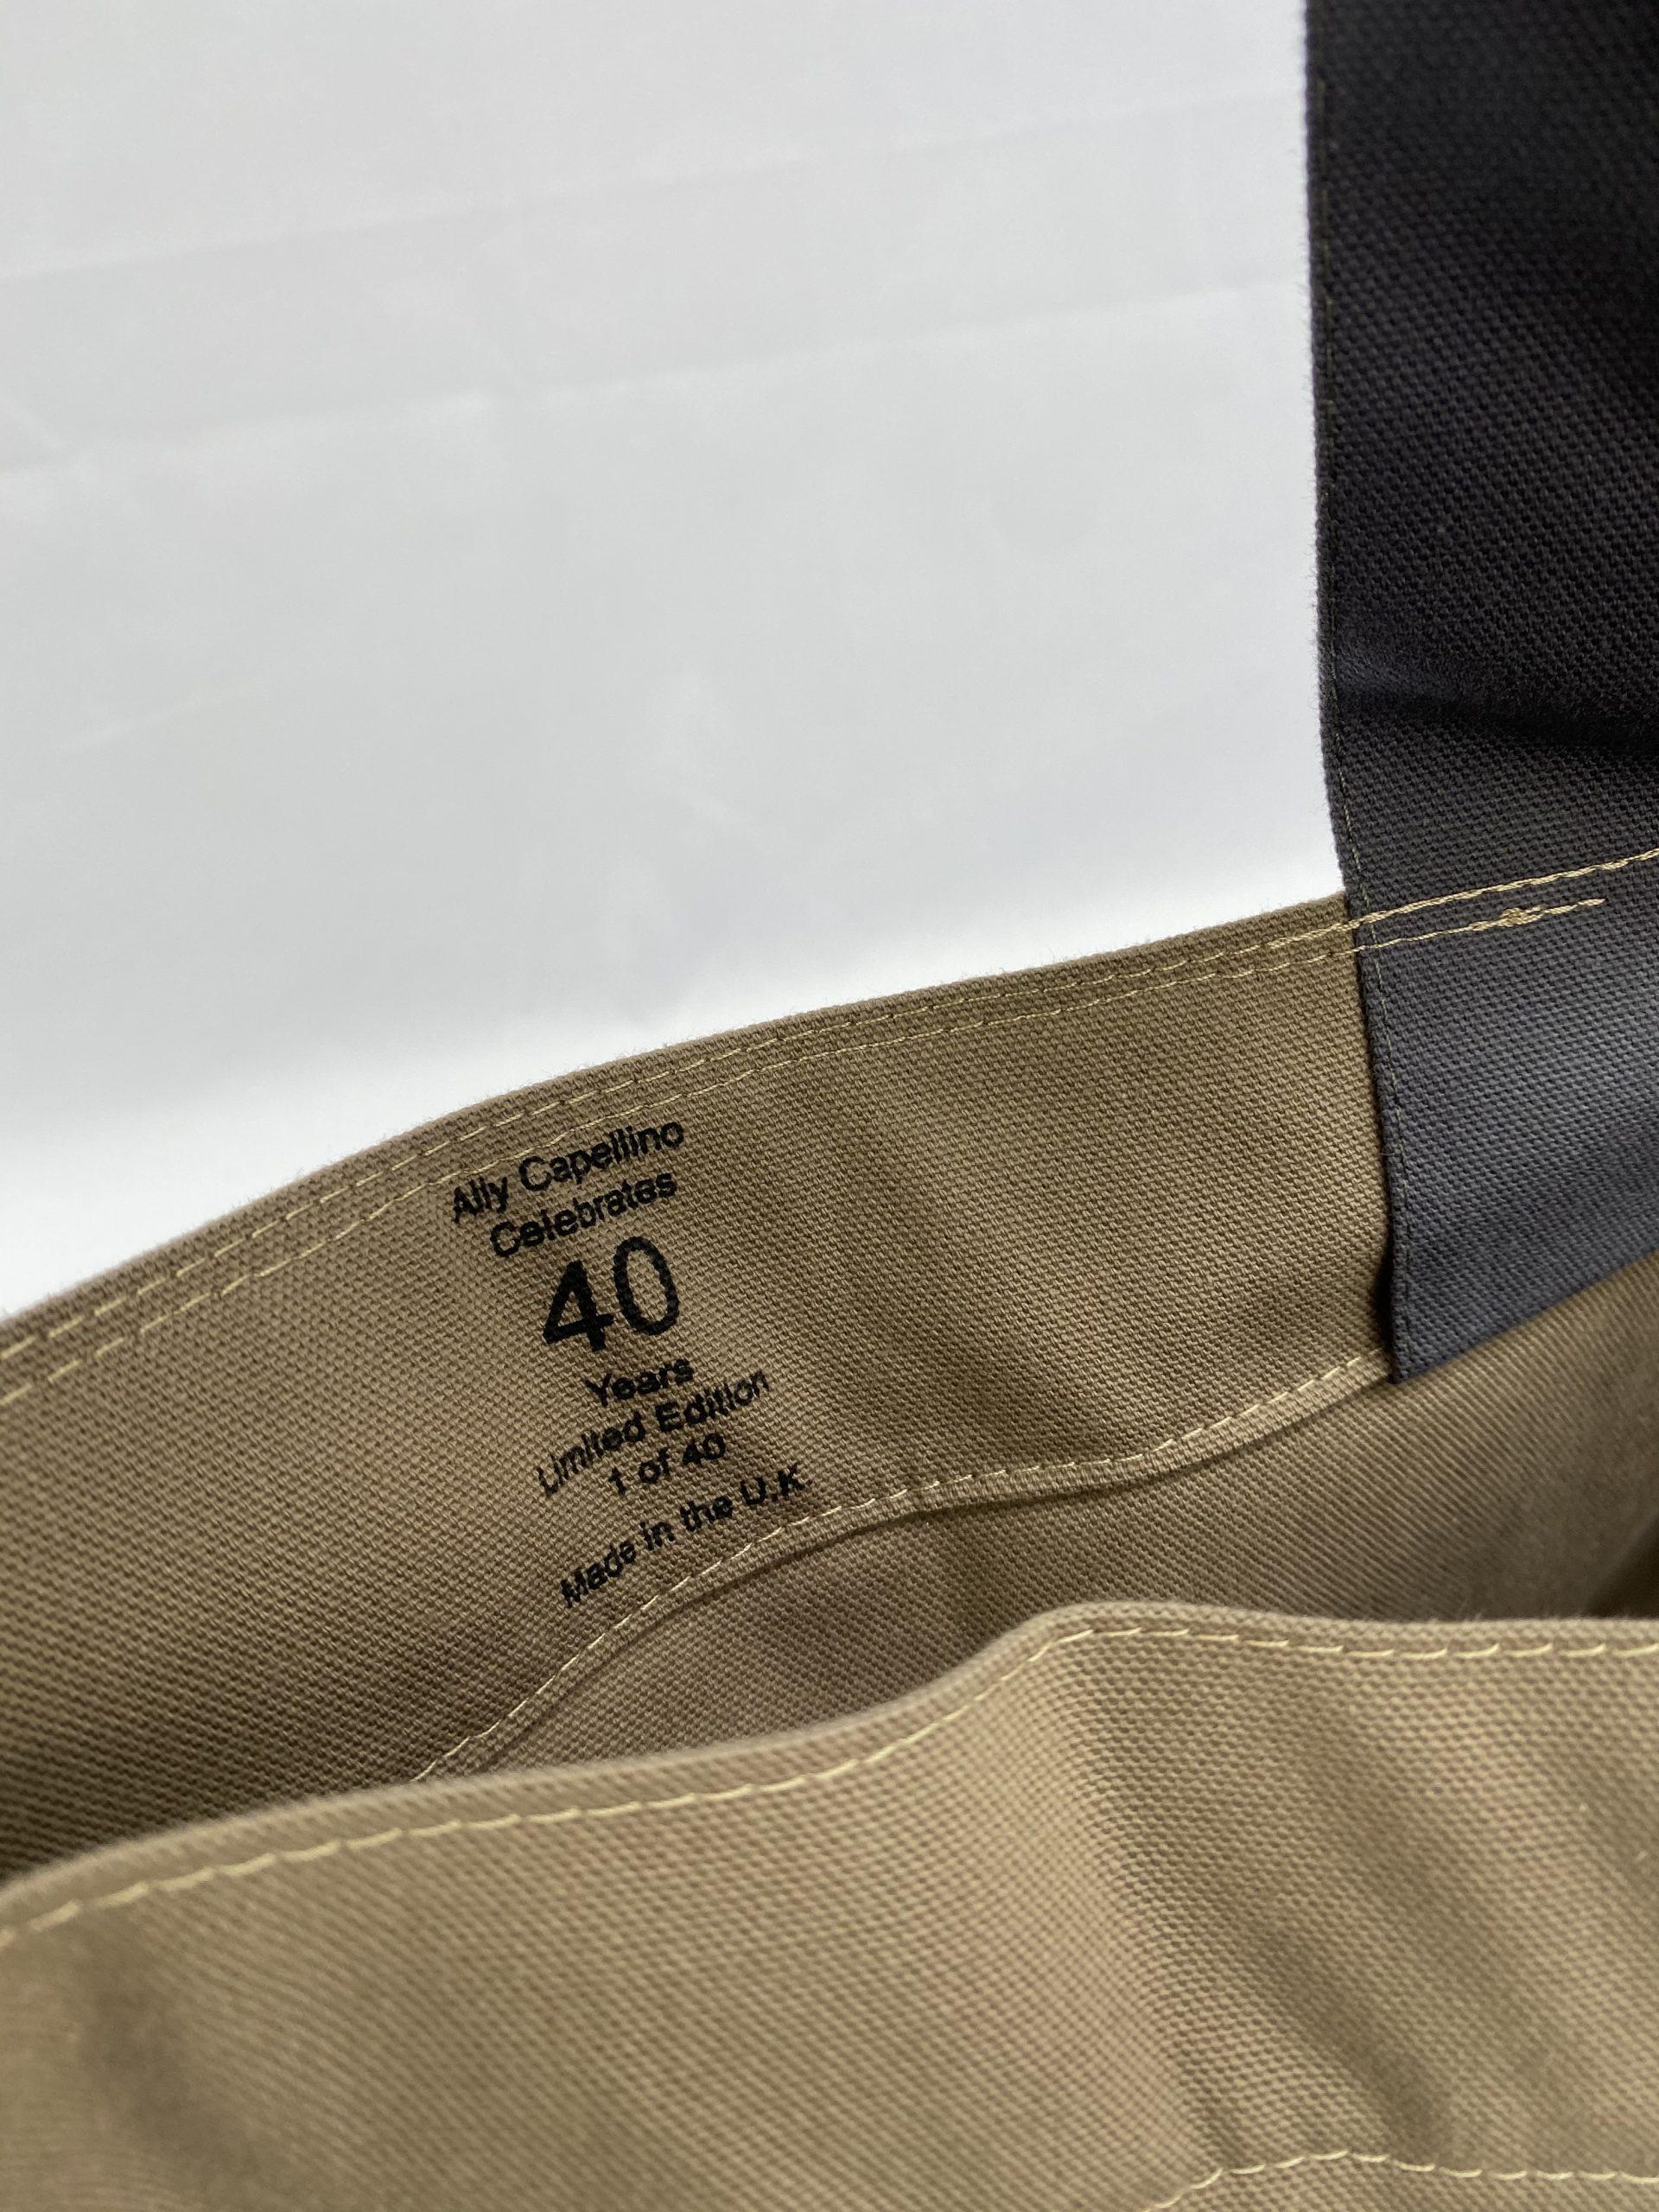 Ally Capellino bu printed tote bag